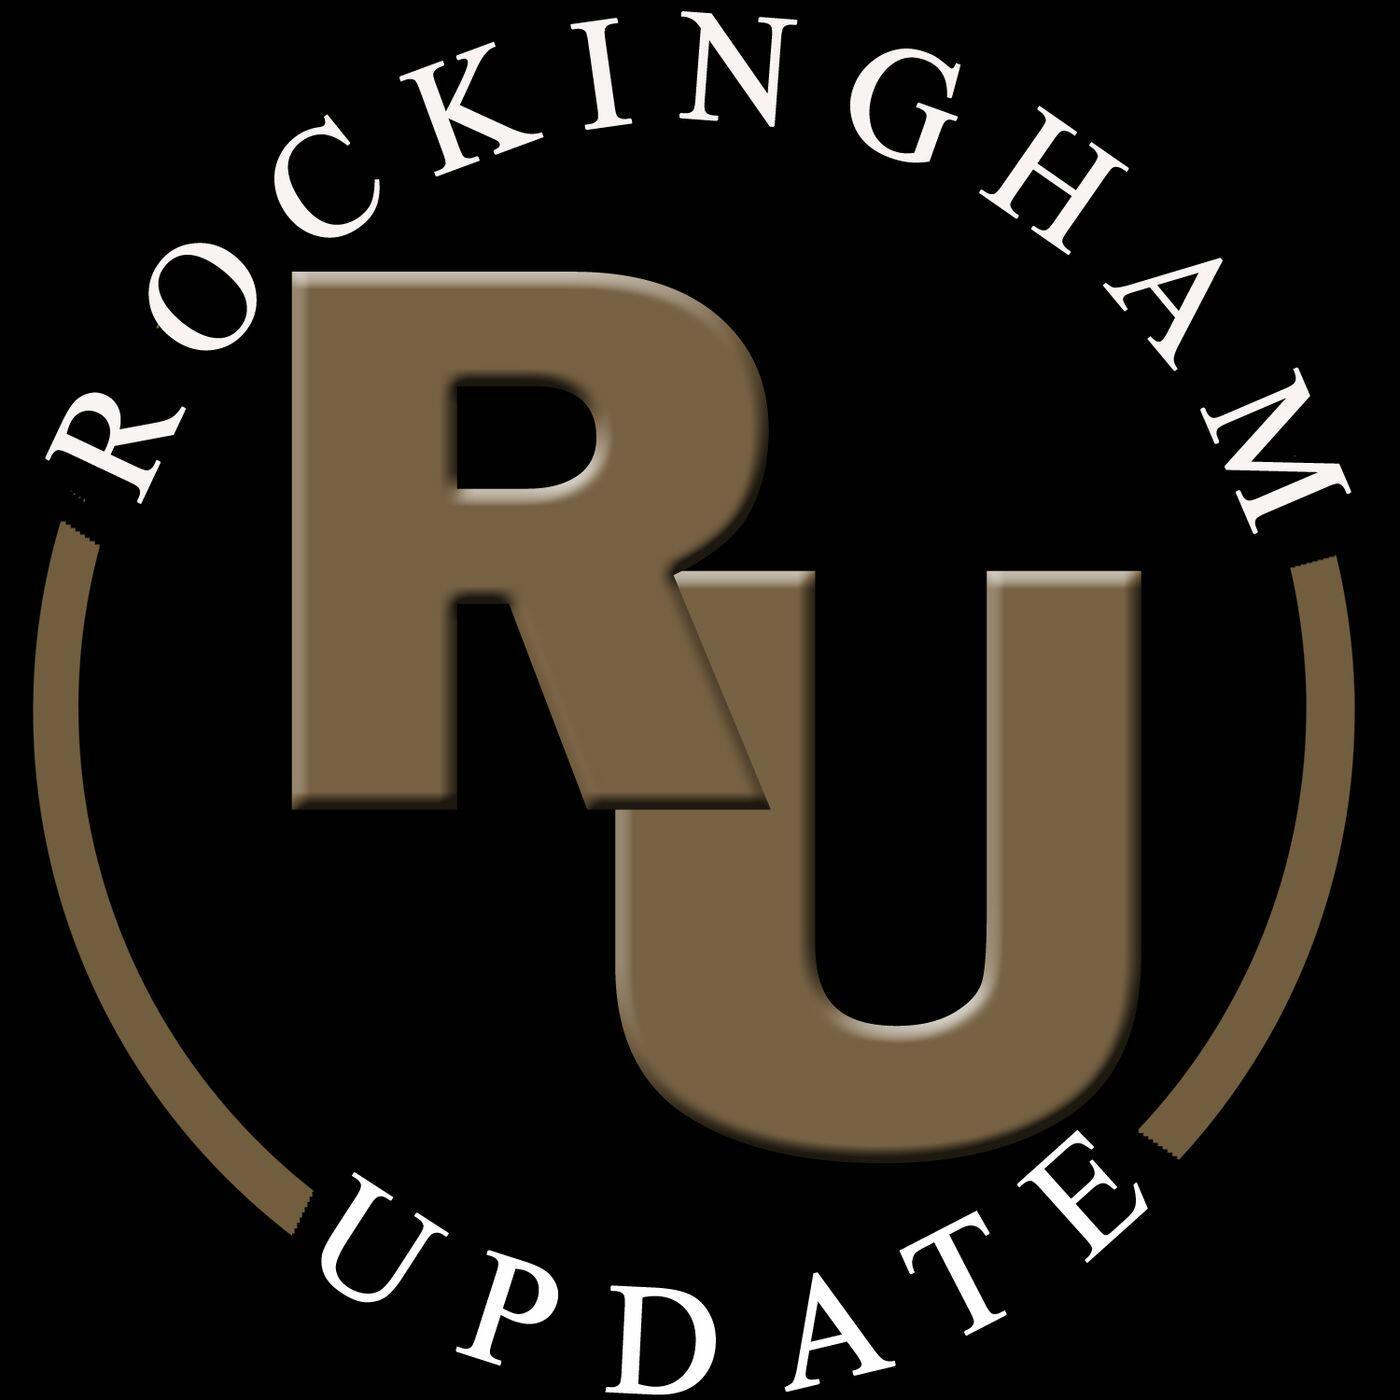 Listen Free to Politics/News - Rockingham County, NC on